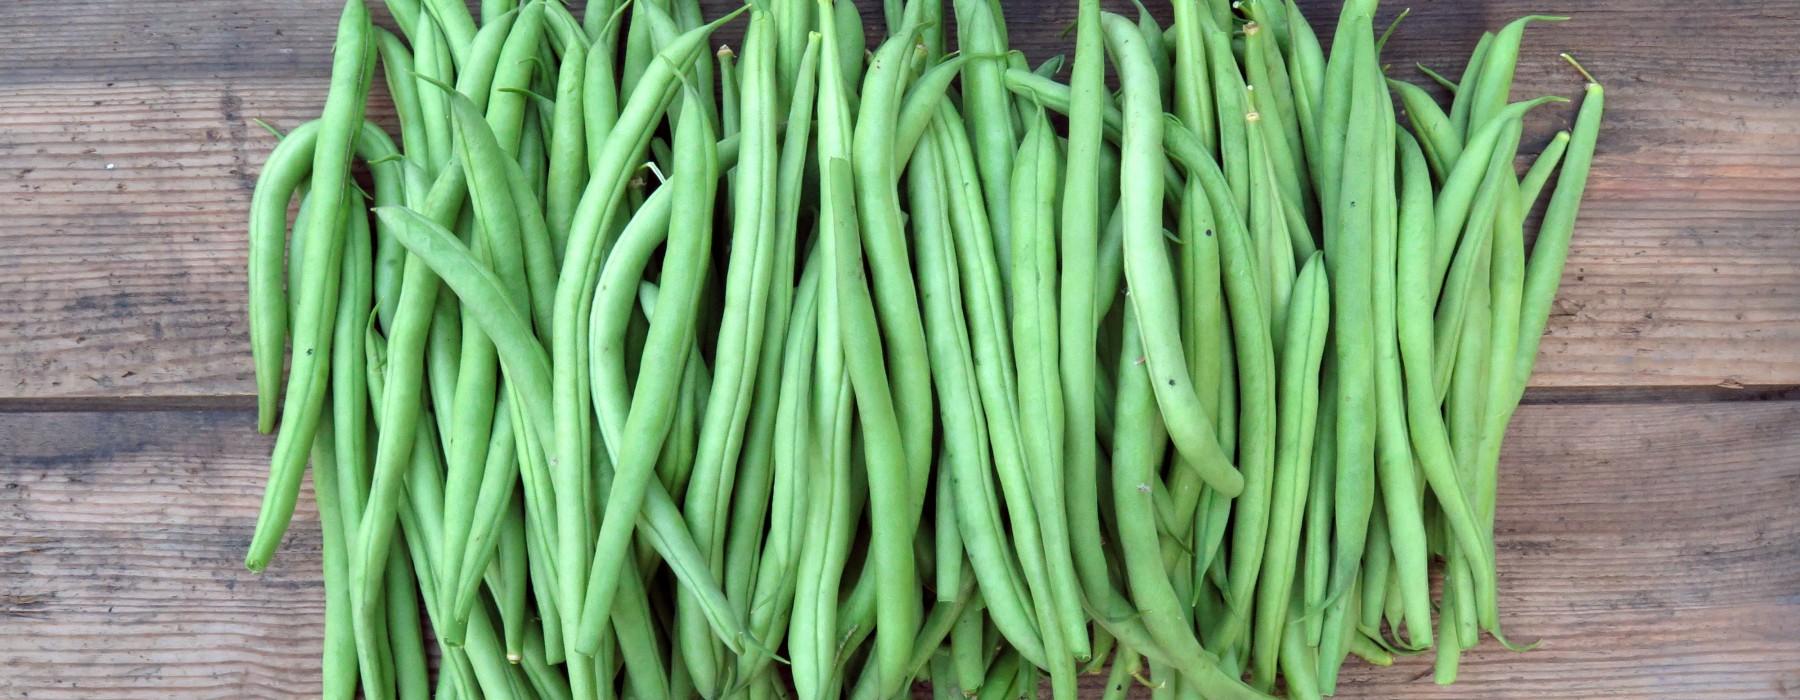 Beans Beans Beans!